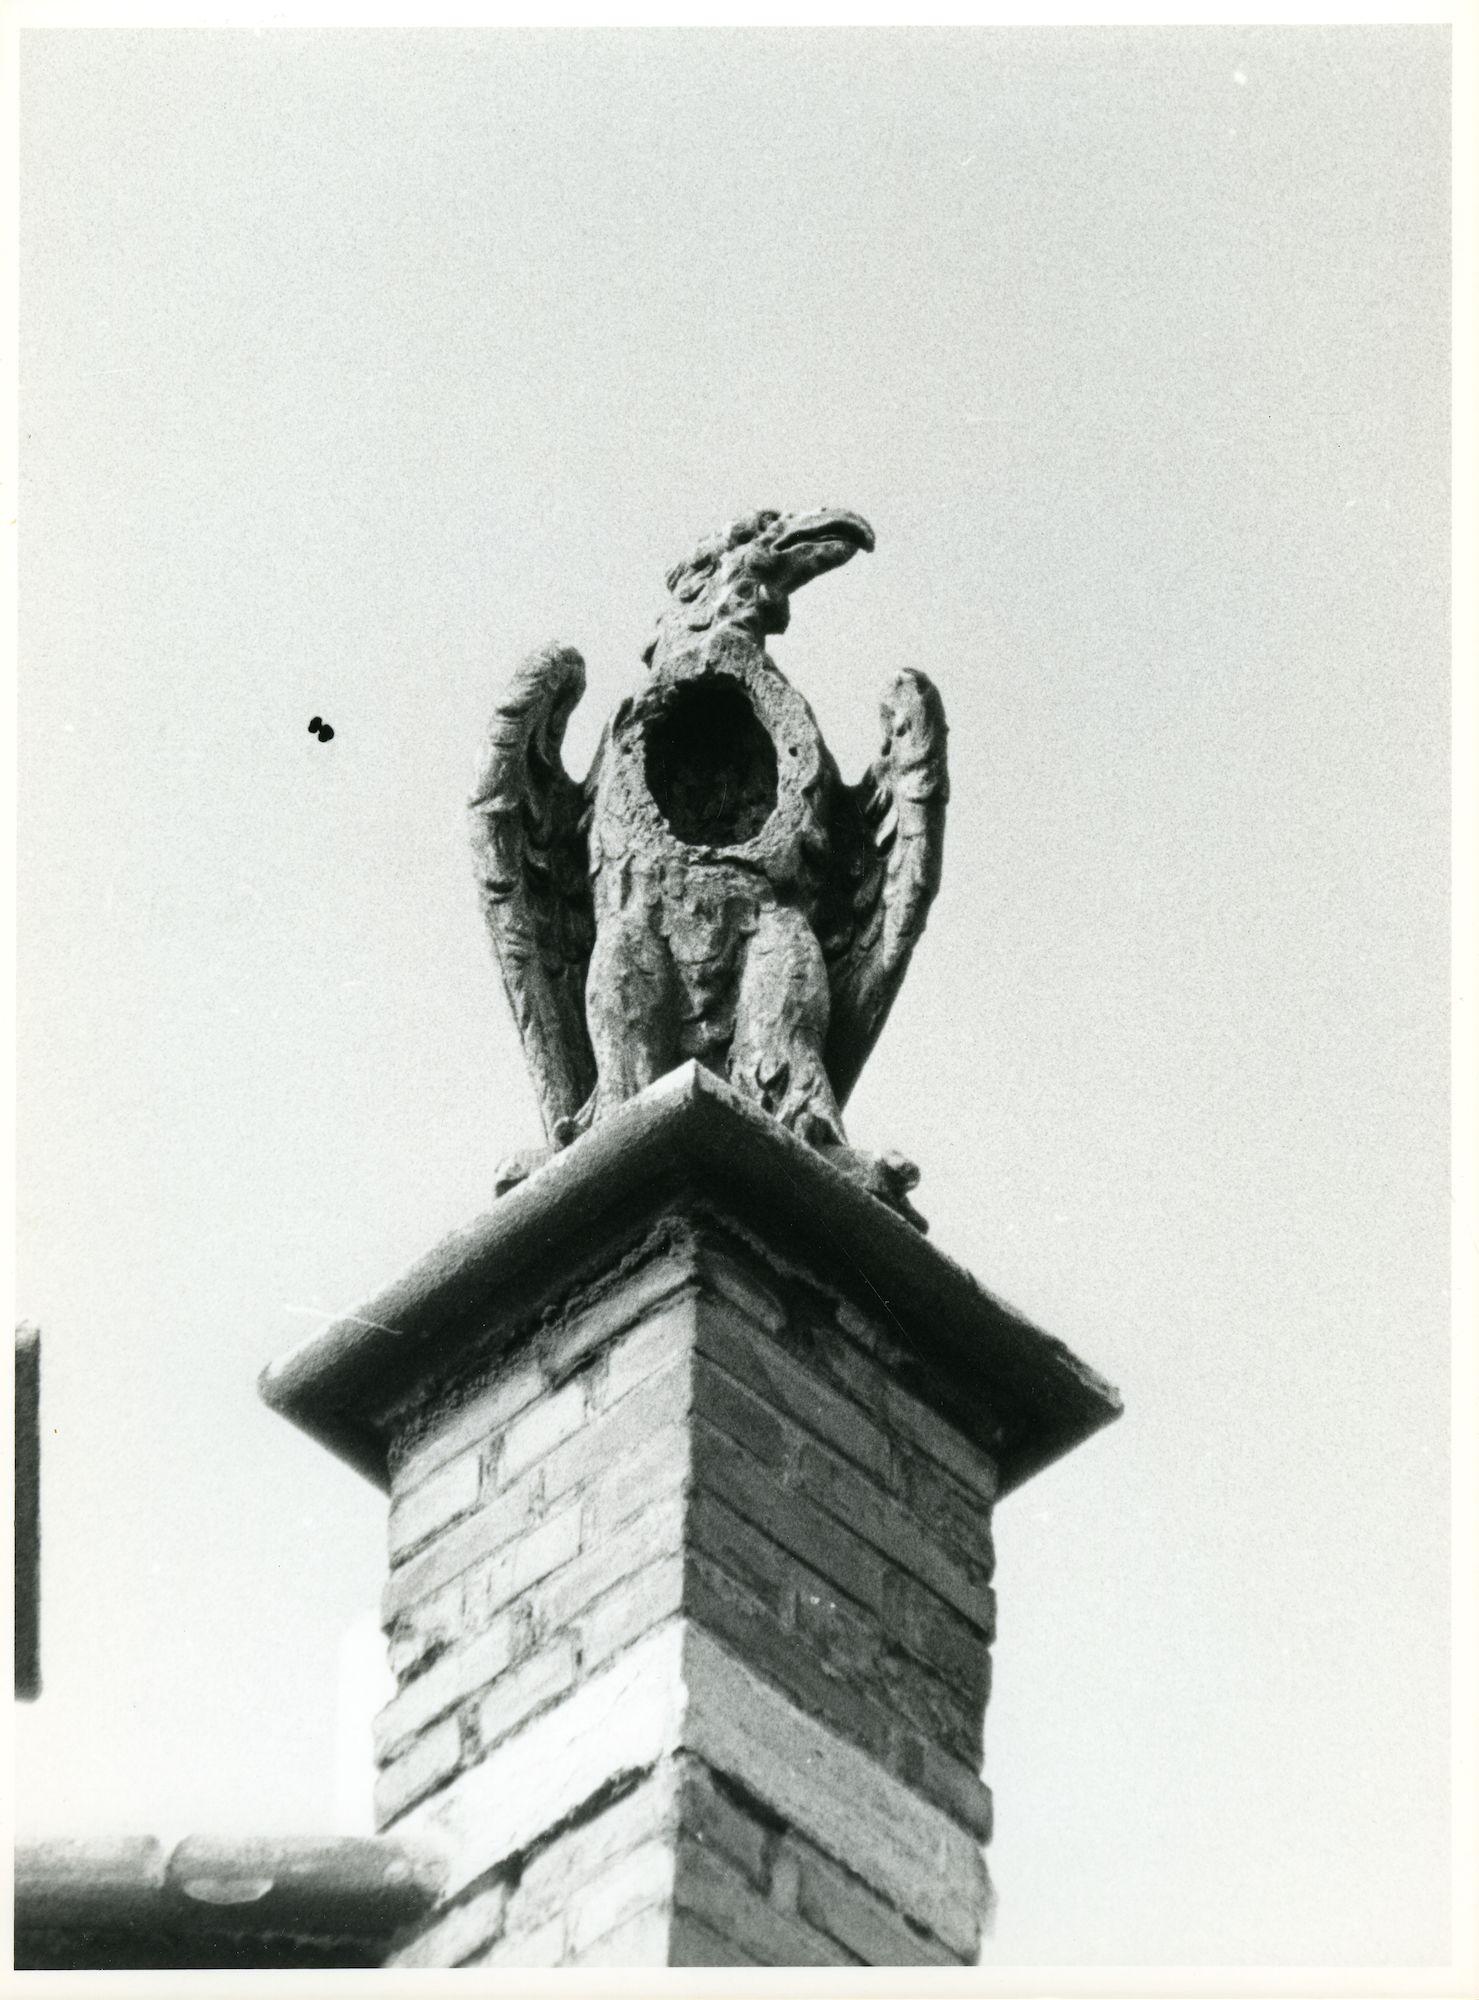 St.-Amandsberg: Bloemistenstraat 30: Beeldhouwwerk, 1979